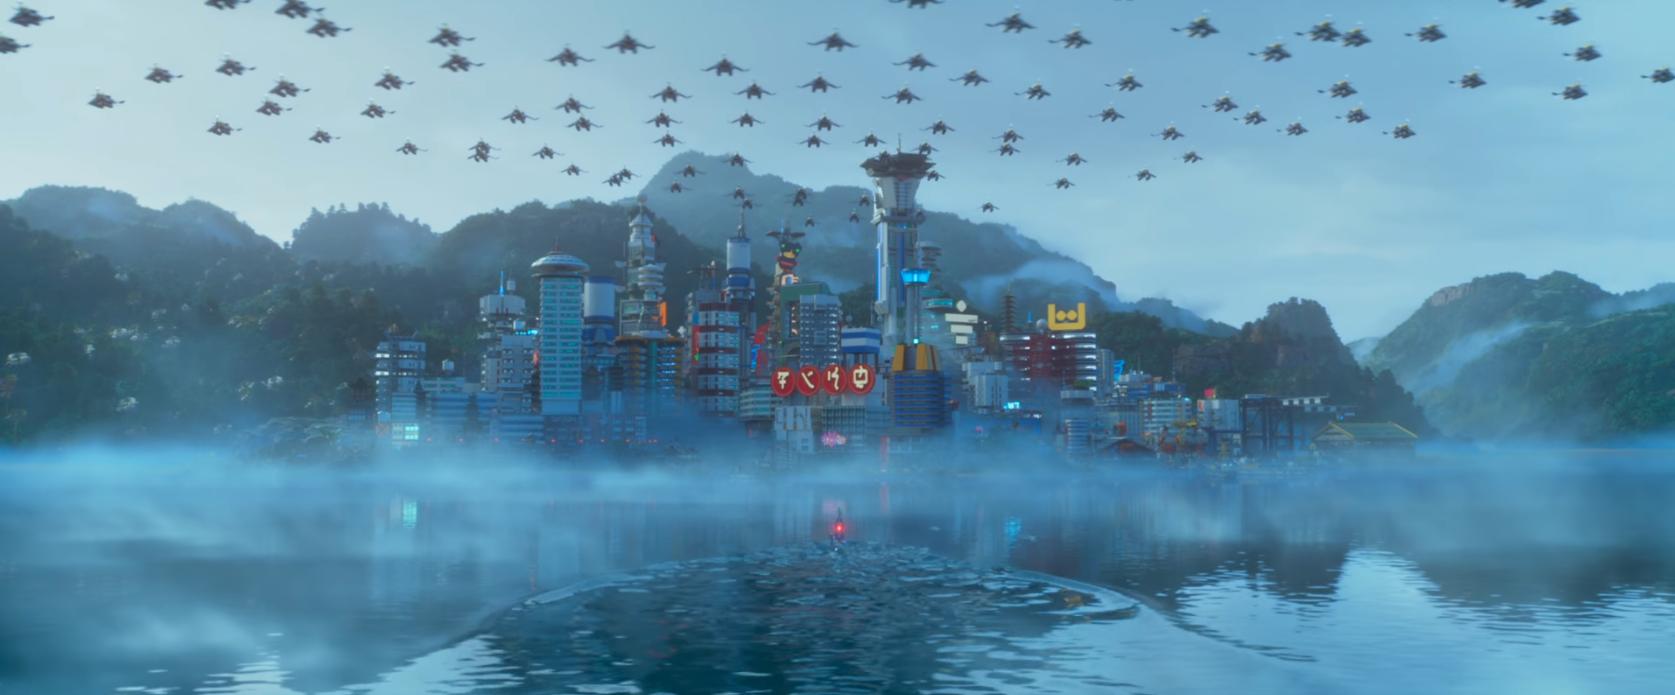 Lego Movie Building Scene